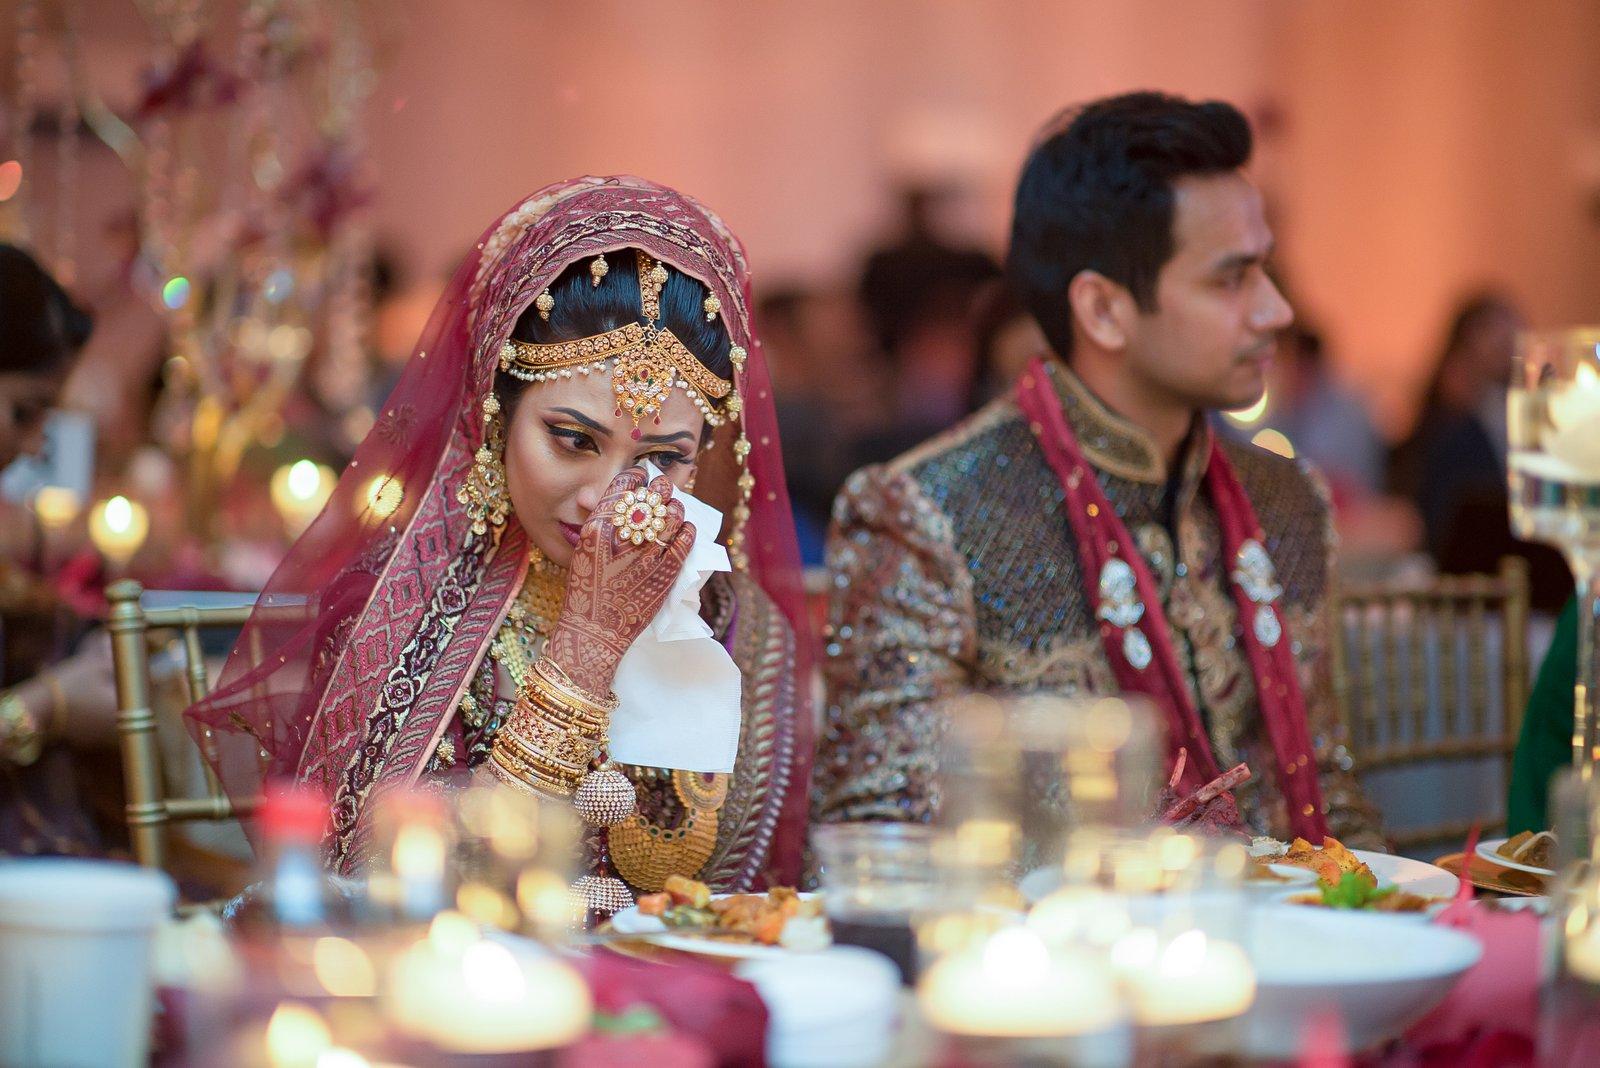 Farhana + Bashir | Miami Wedding Photographers | Häring